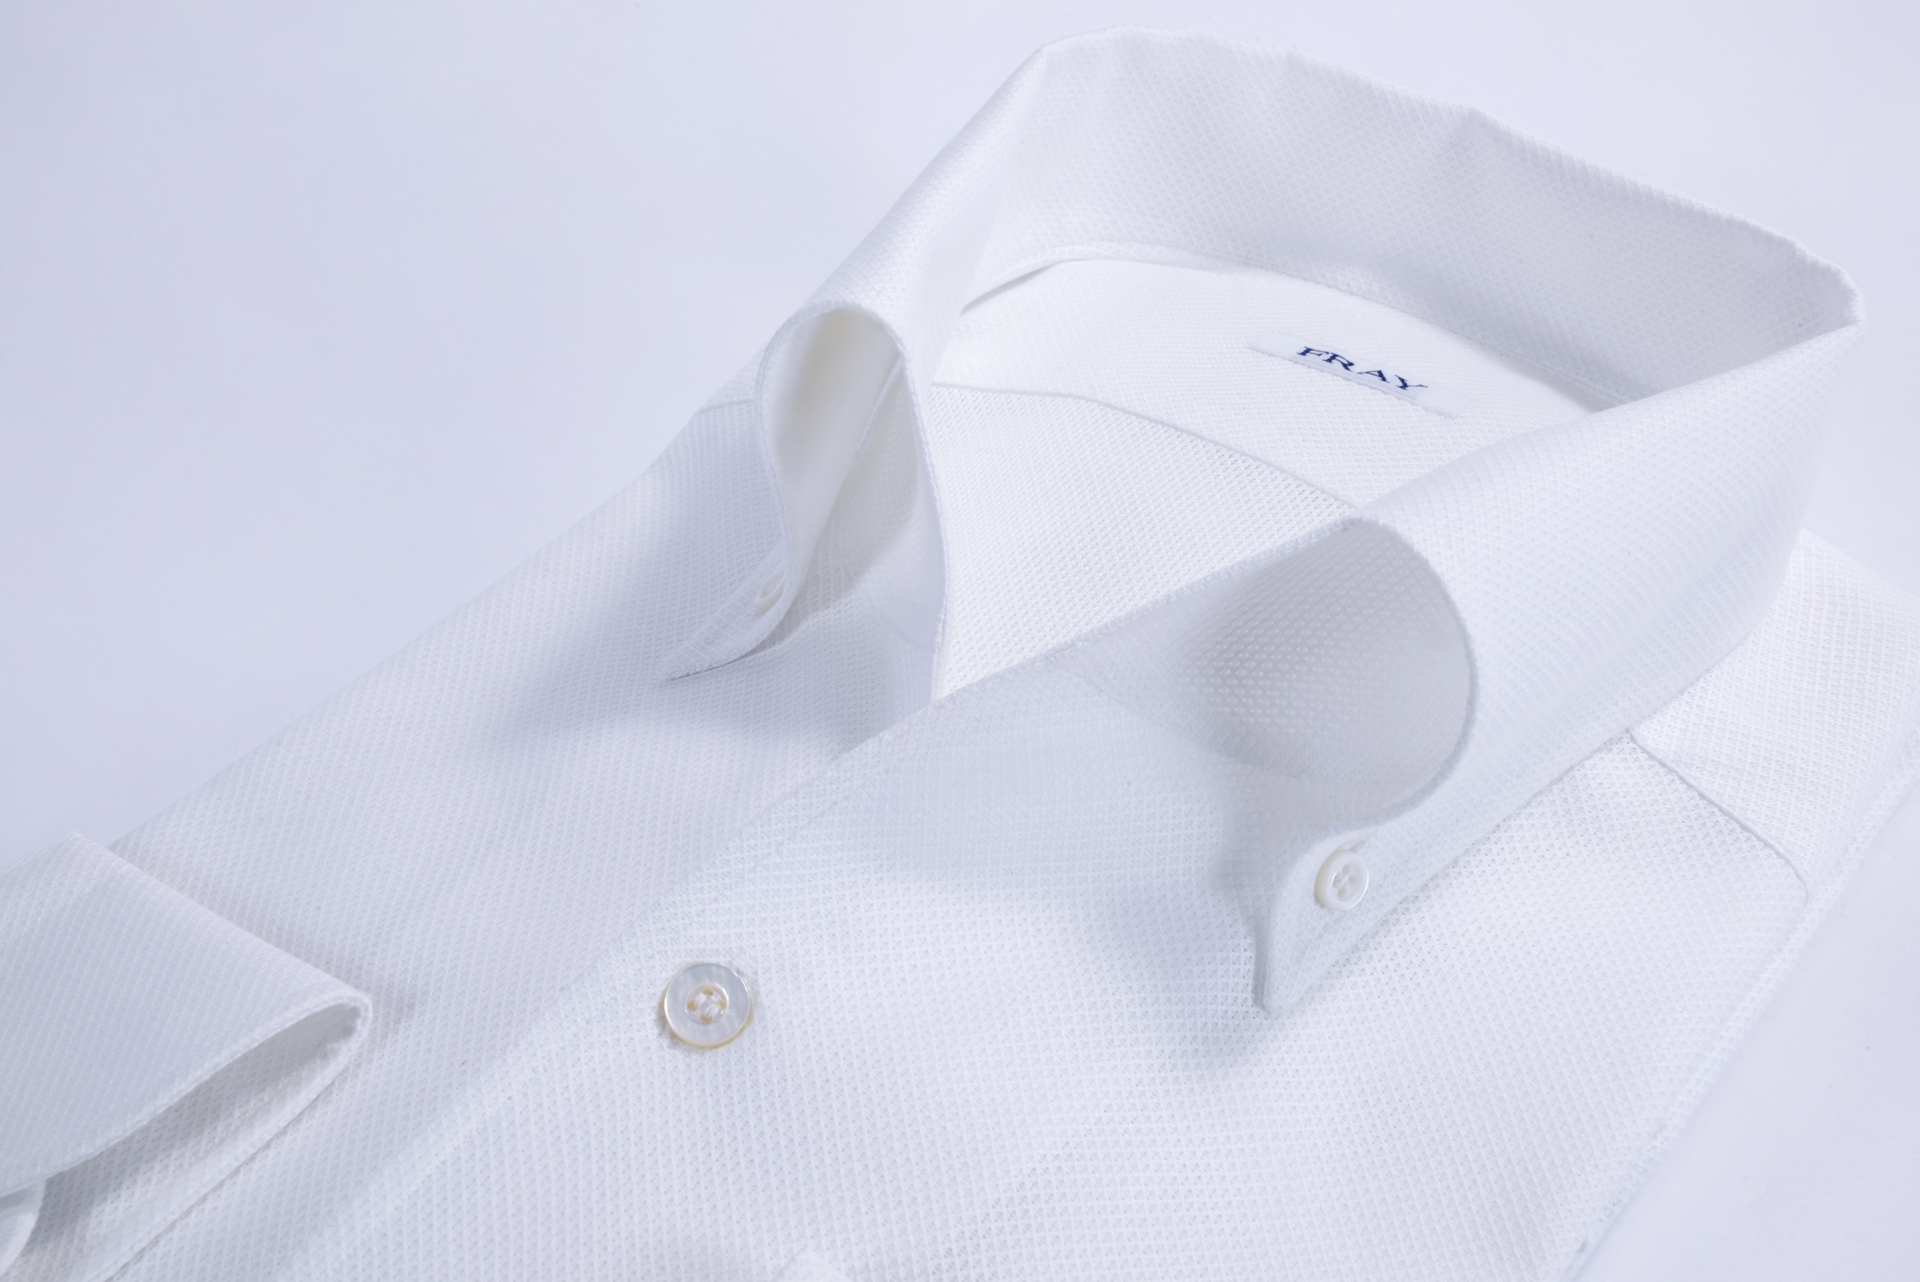 Fray produzione camicie